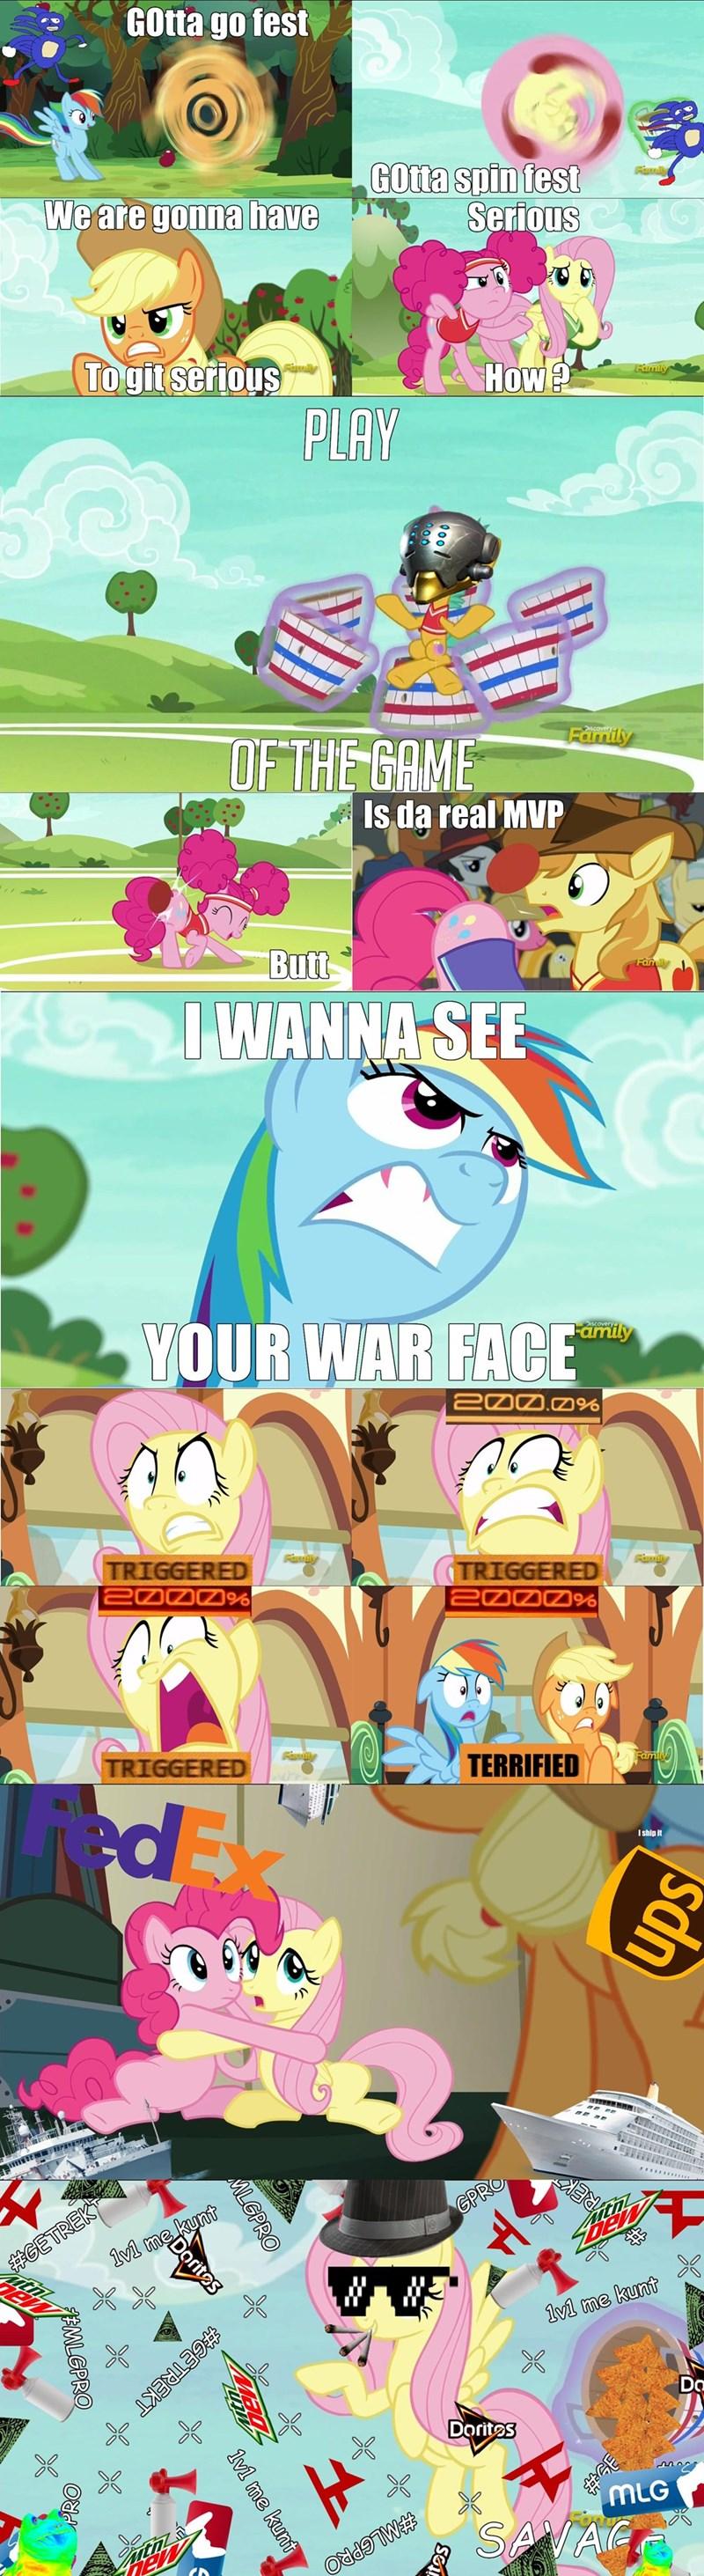 shipping applejack sanic braeburn pinkie pie dank memes Memes fluttershy rainbow dash MLG - 8973742848